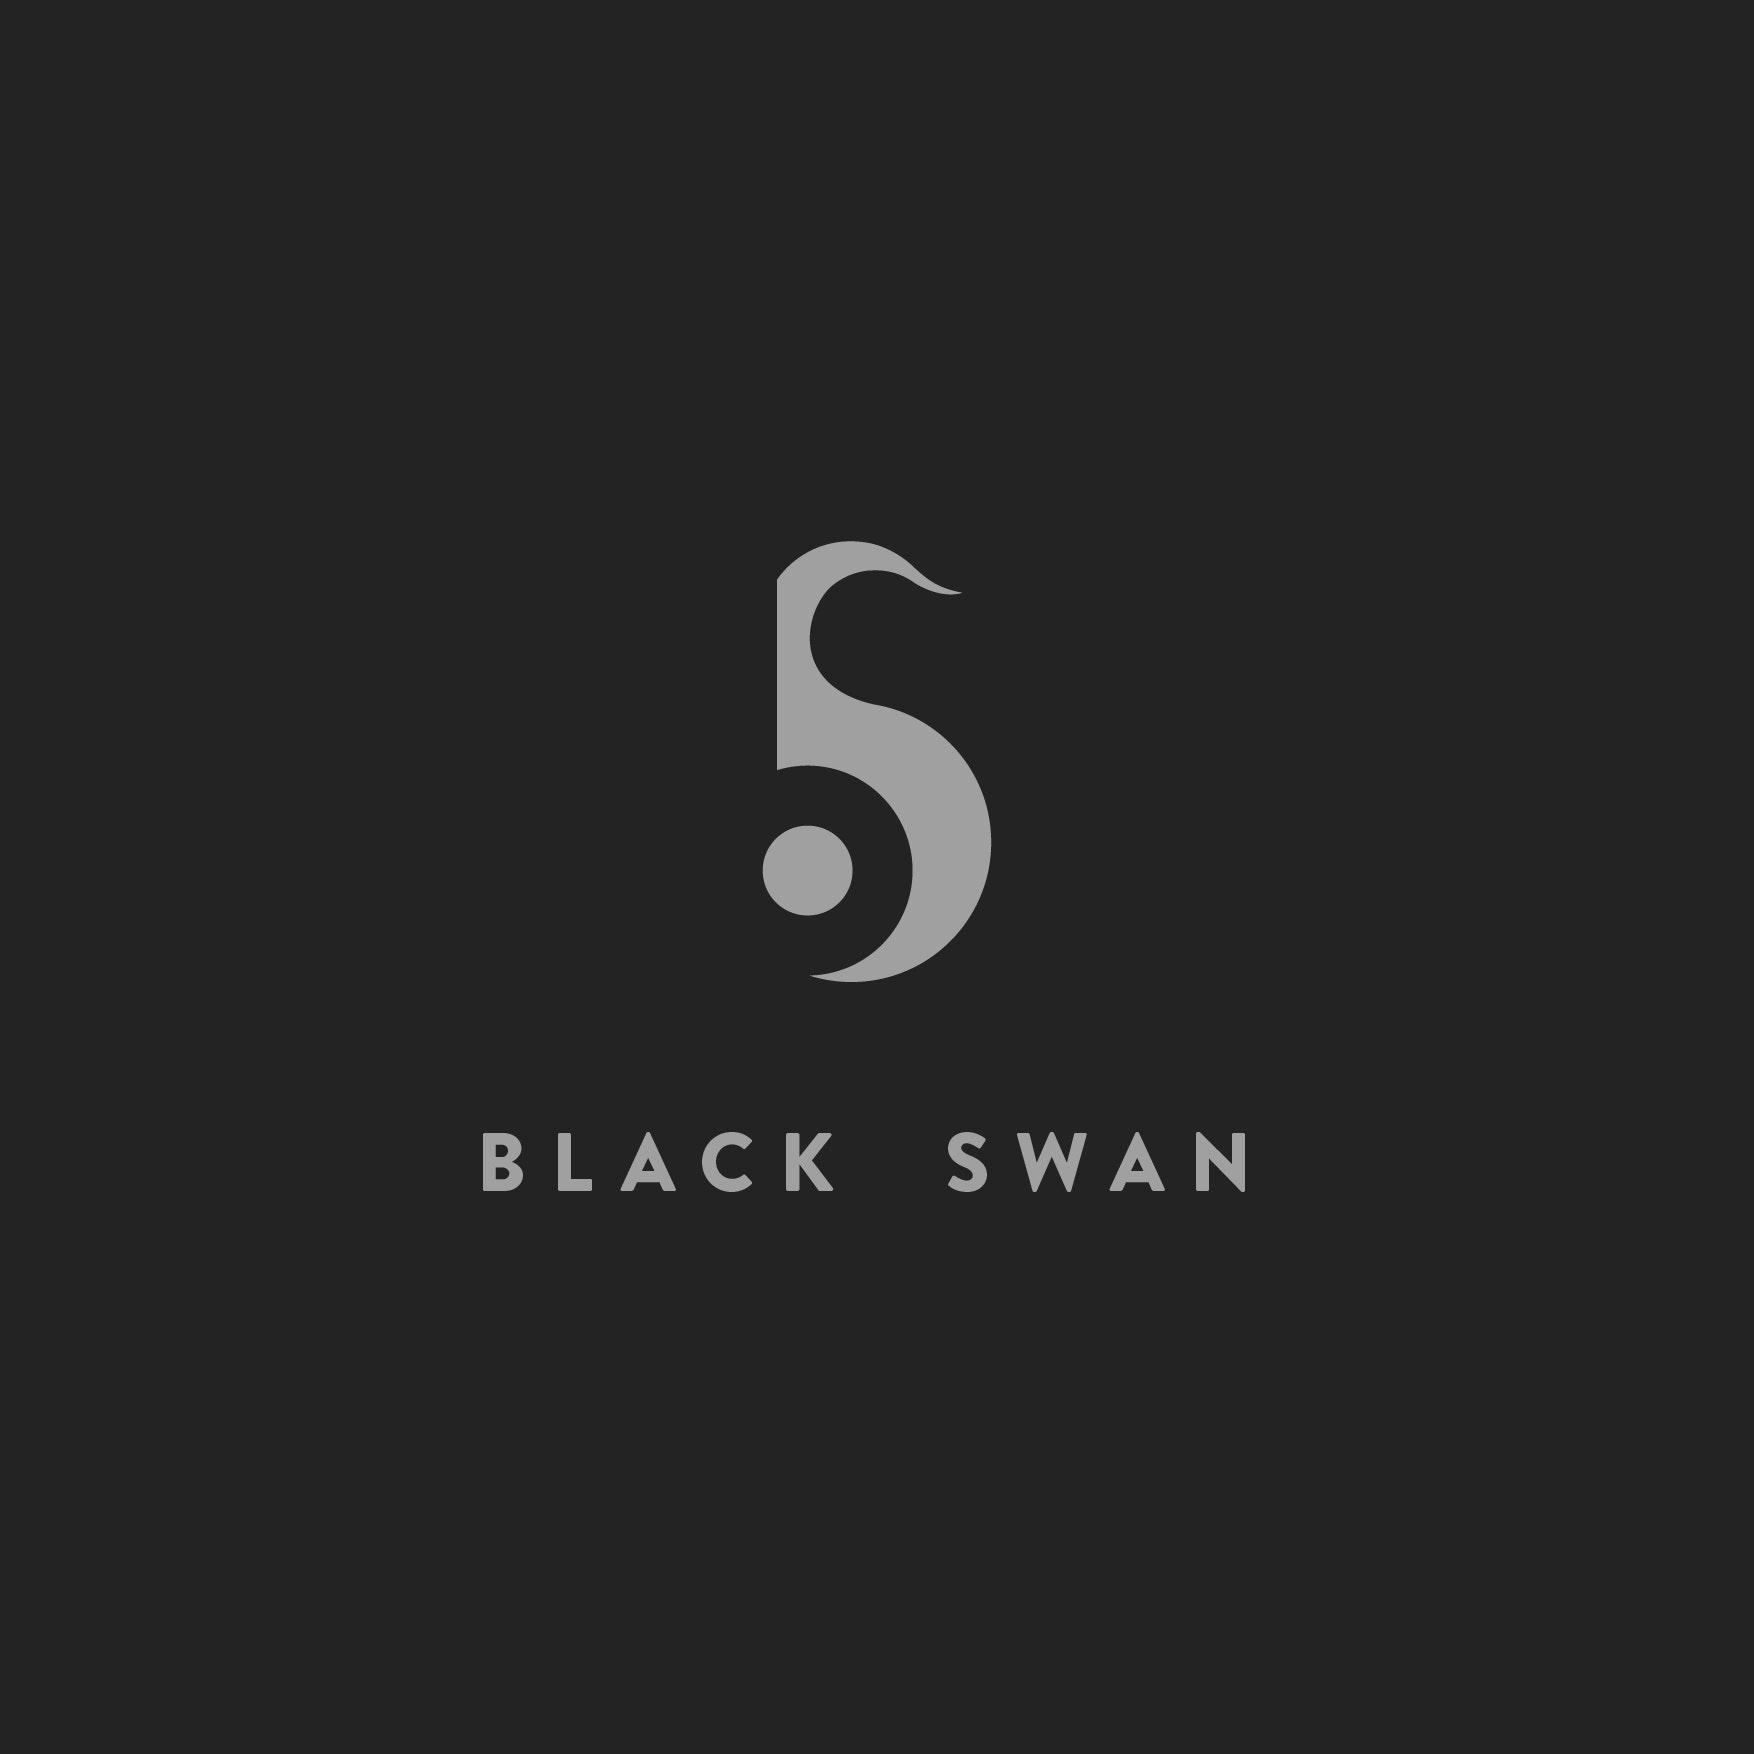 Black Swan logo